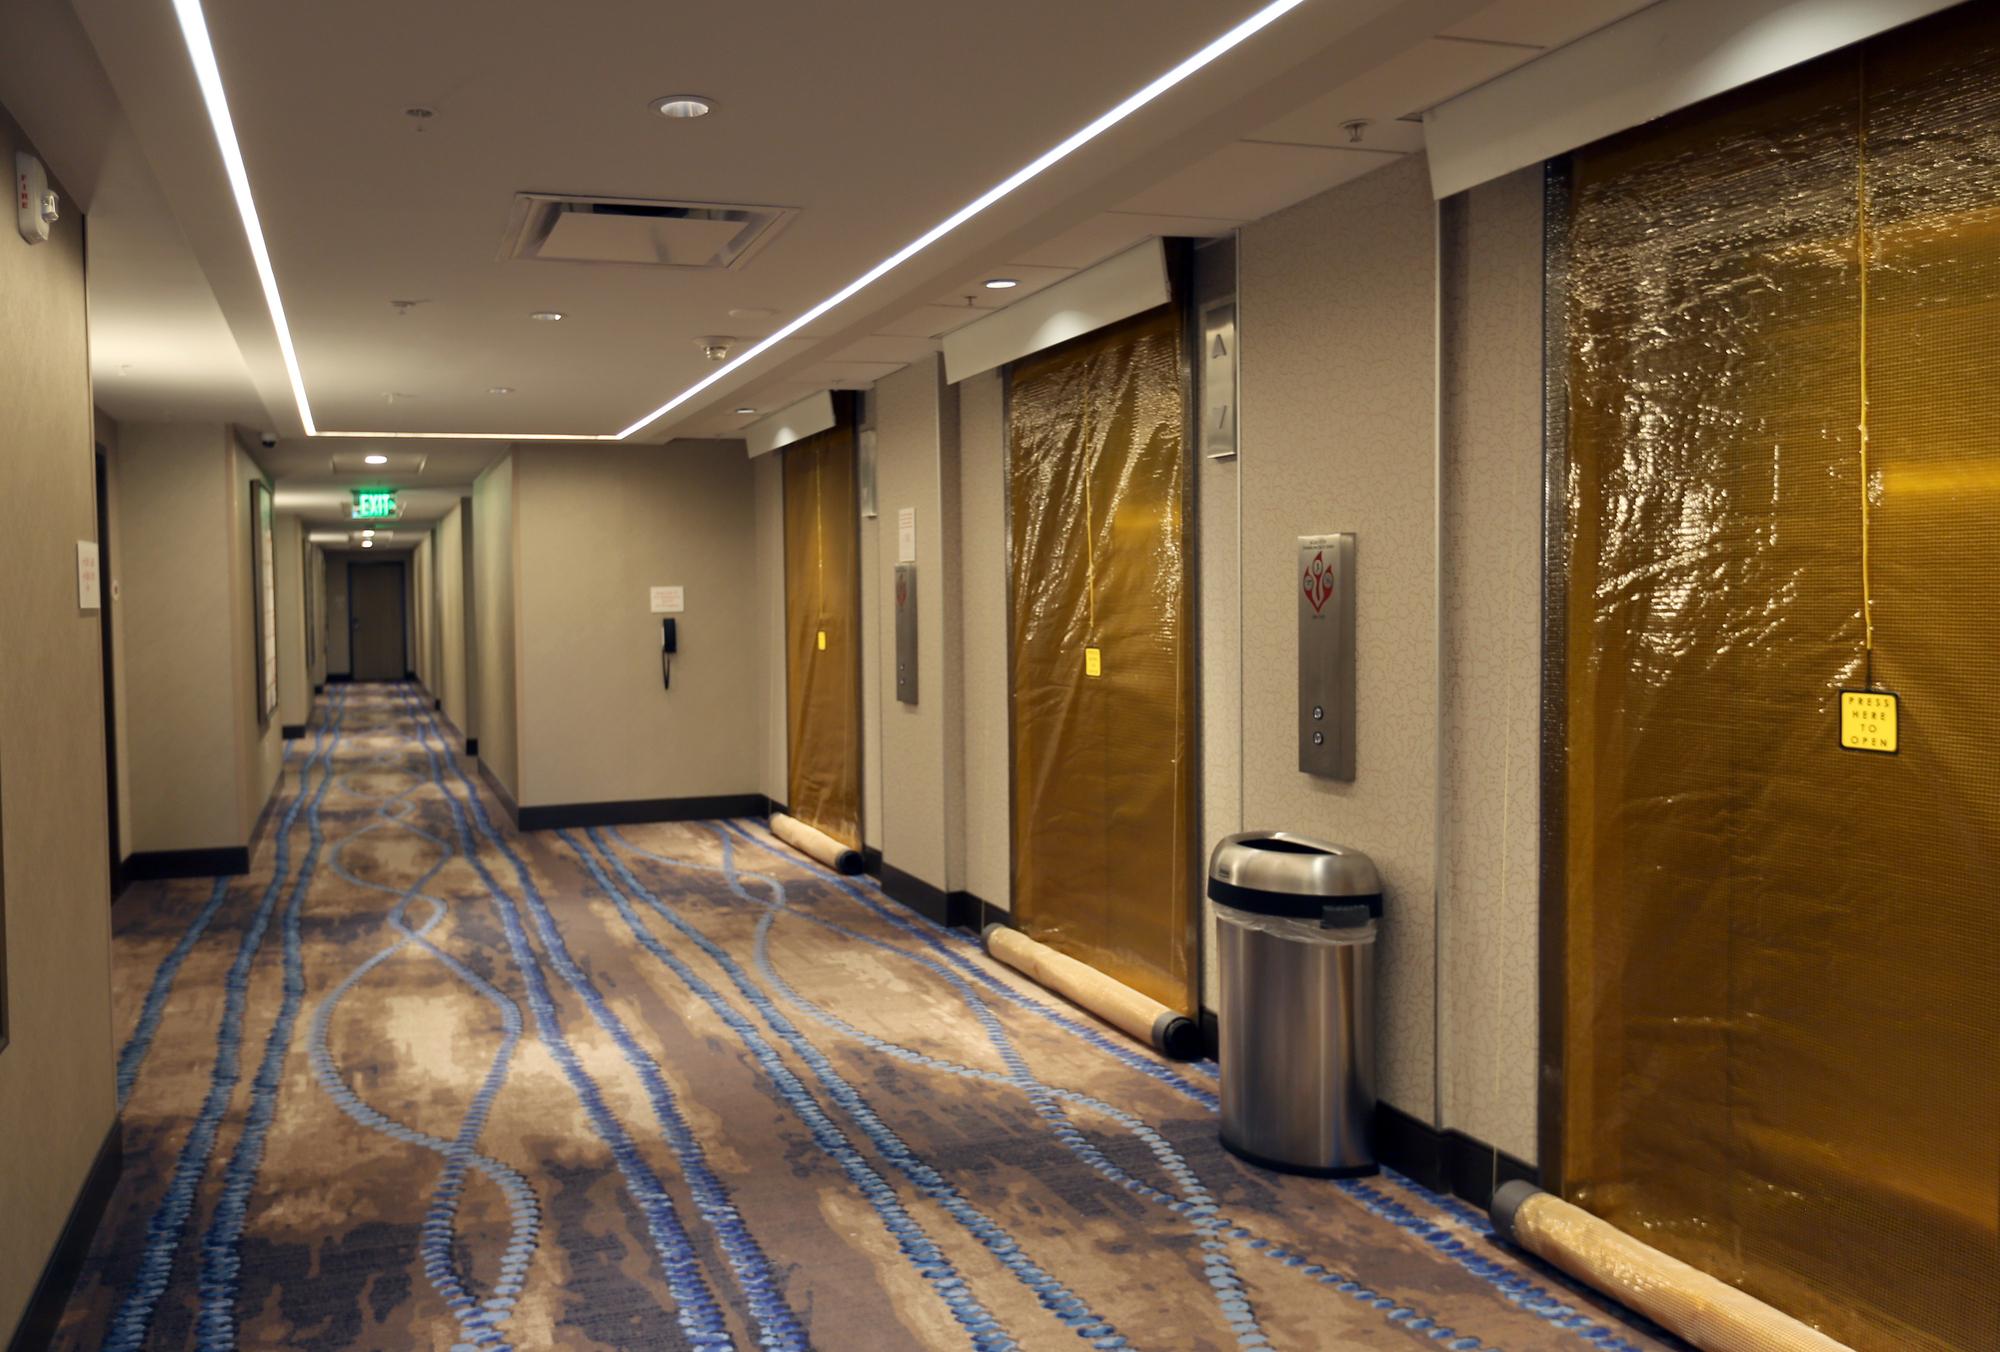 Springhill Suites/Townplace Suites by Marriott